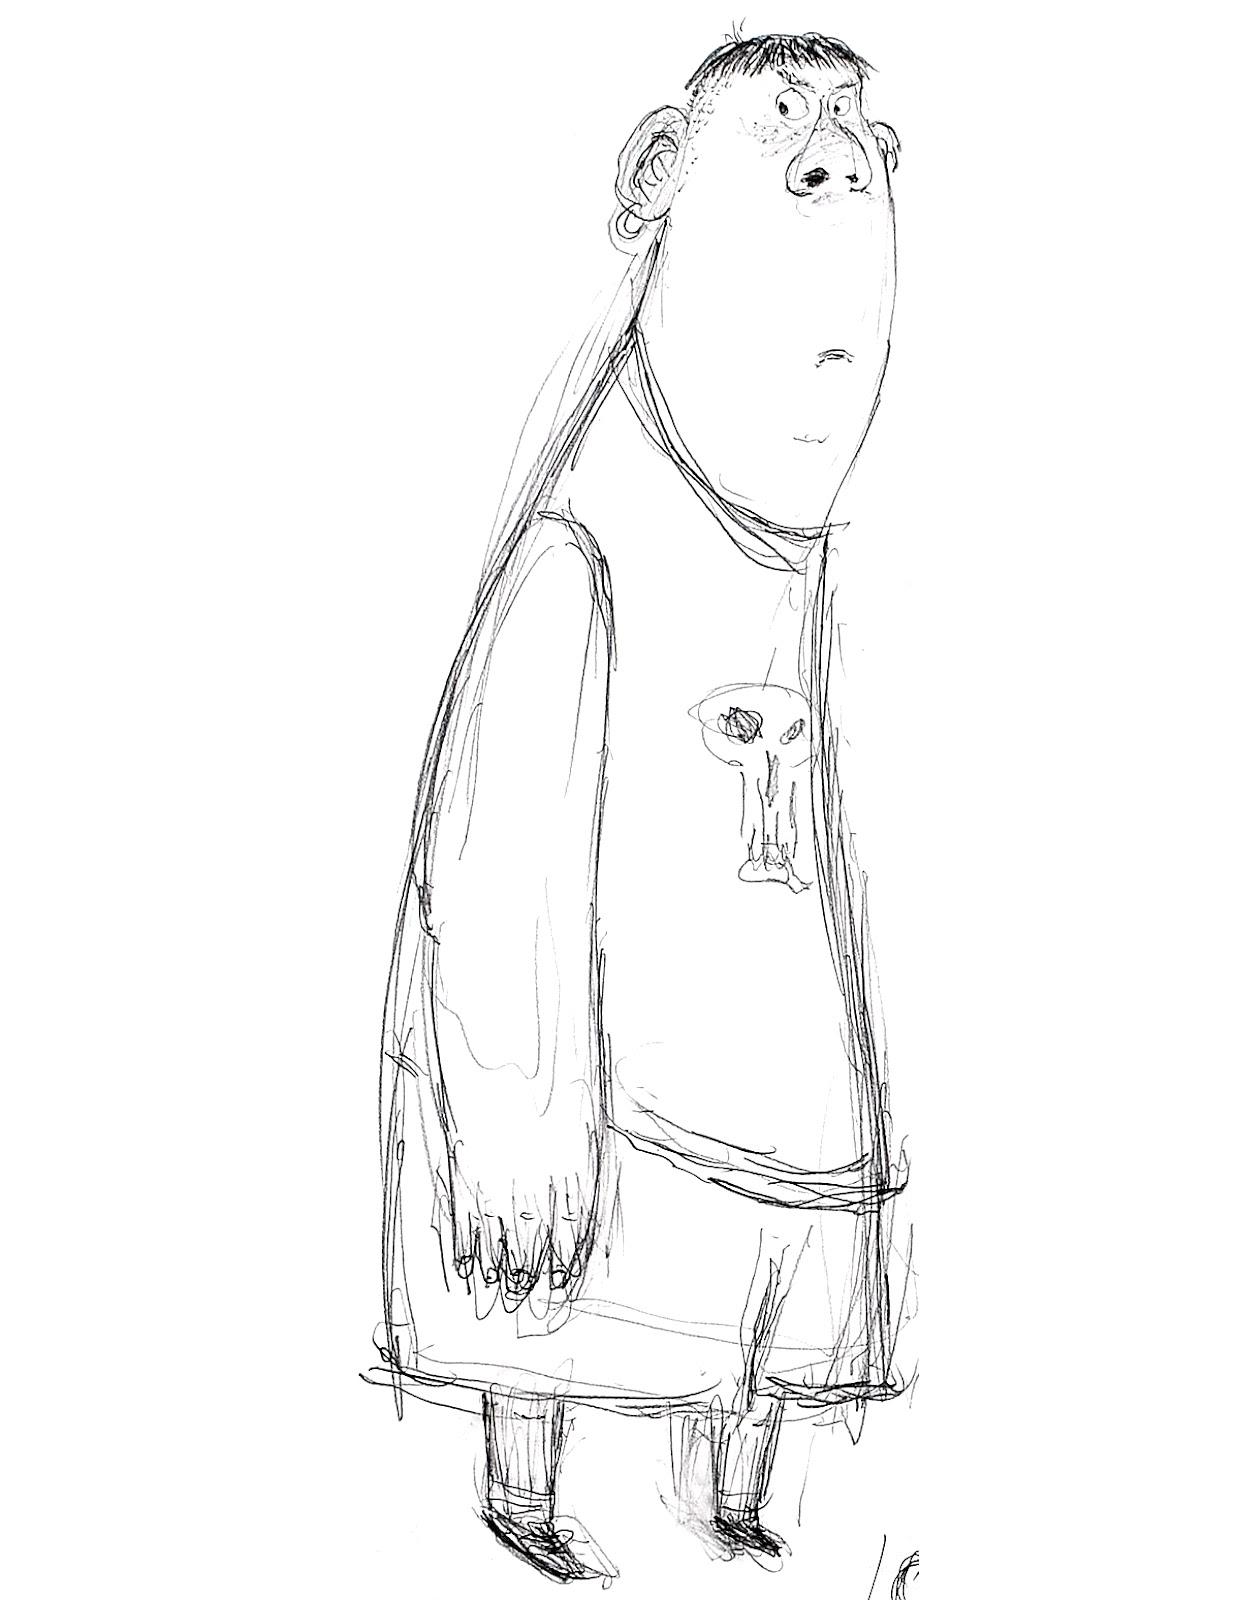 036-paranorman-concept-art-character-design-alvin.jpg